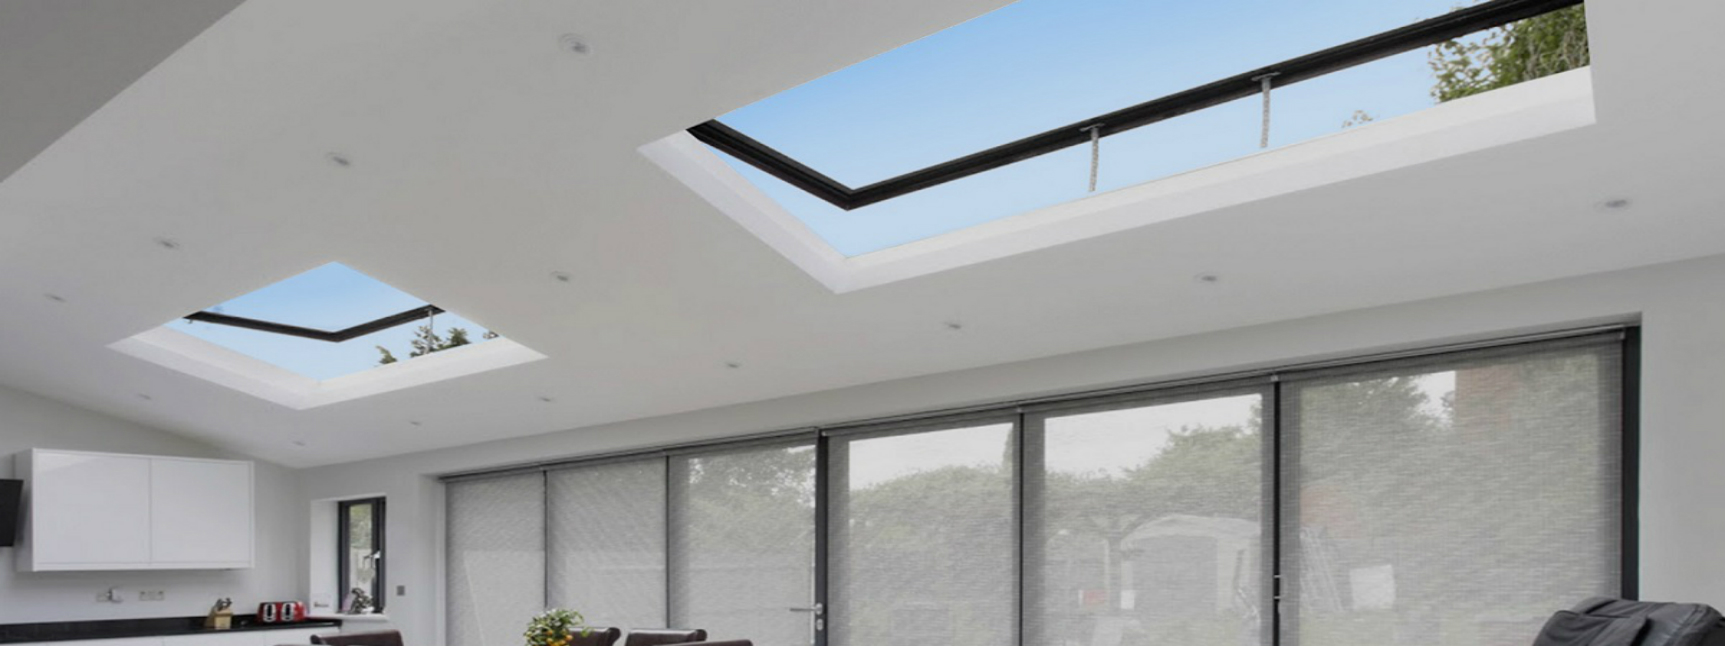 Domed vs. flat skylight